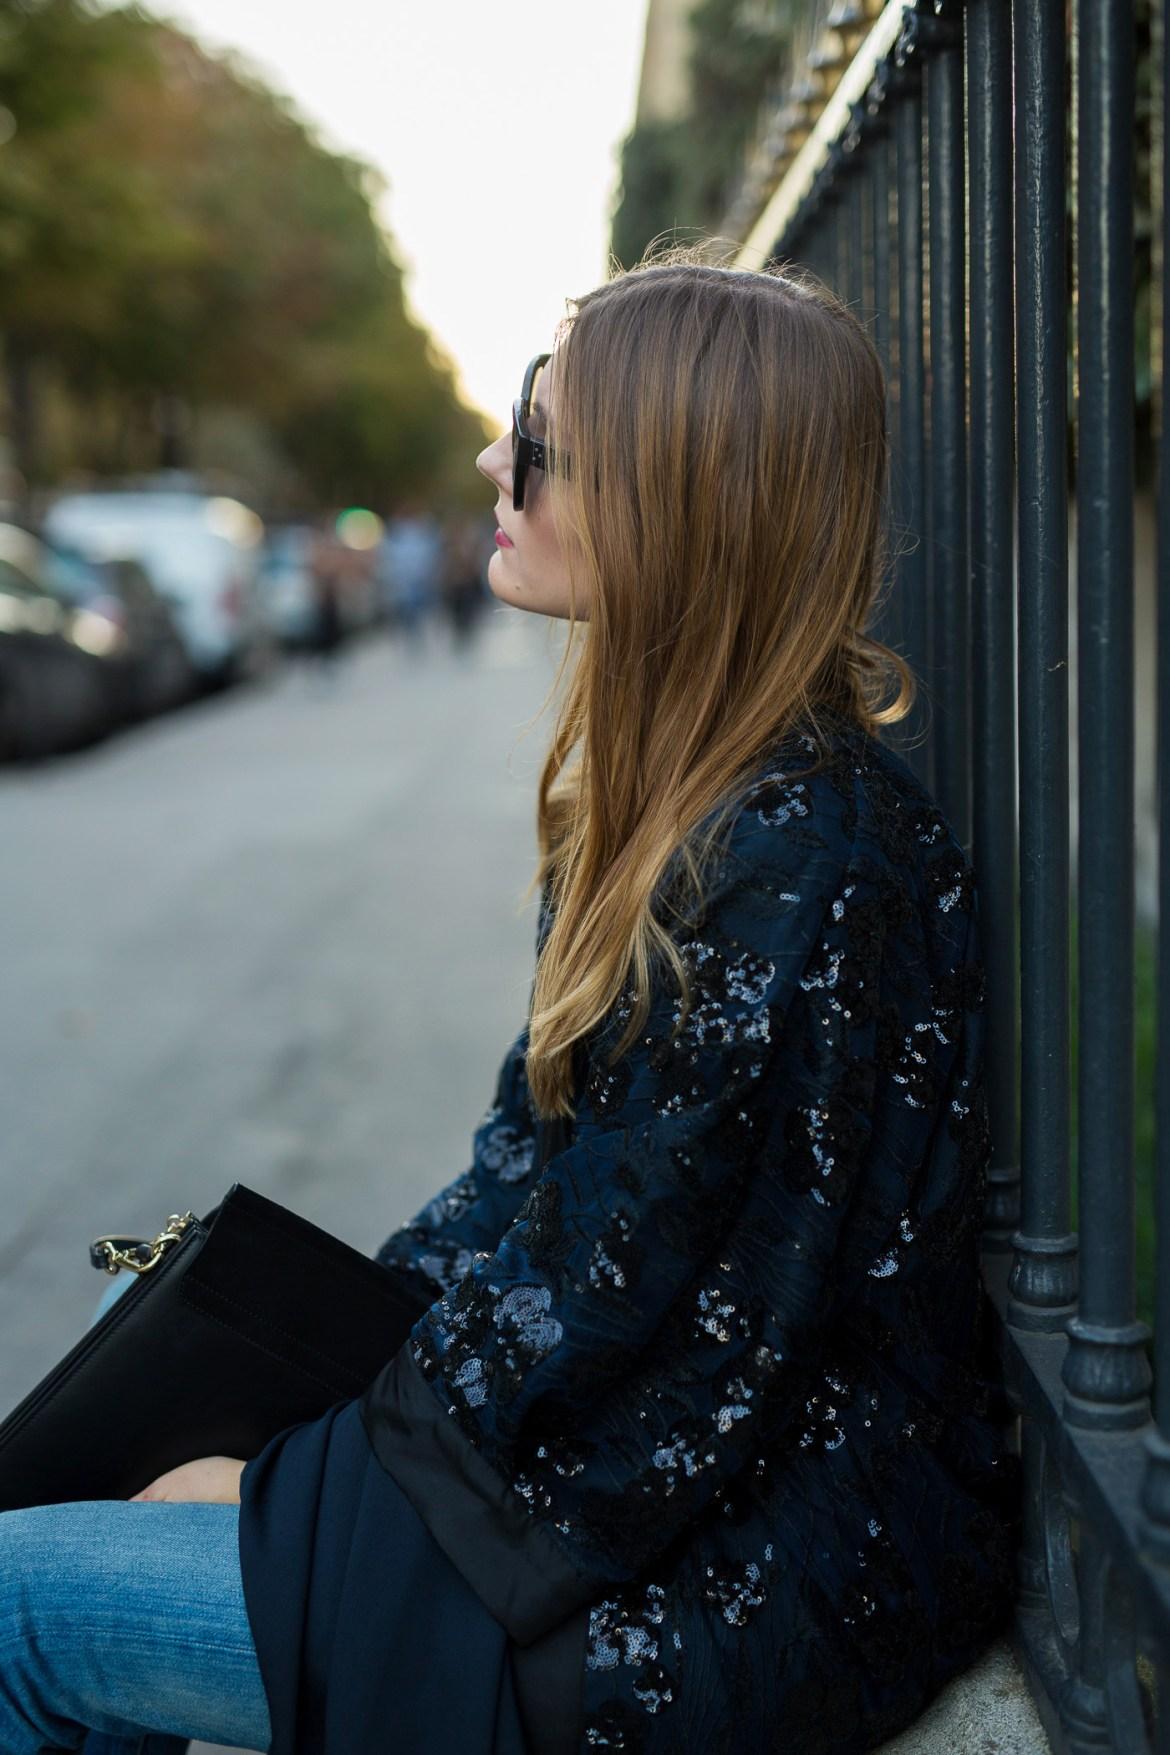 paris_fashion_week_kimono_and_bell_sleeves_7